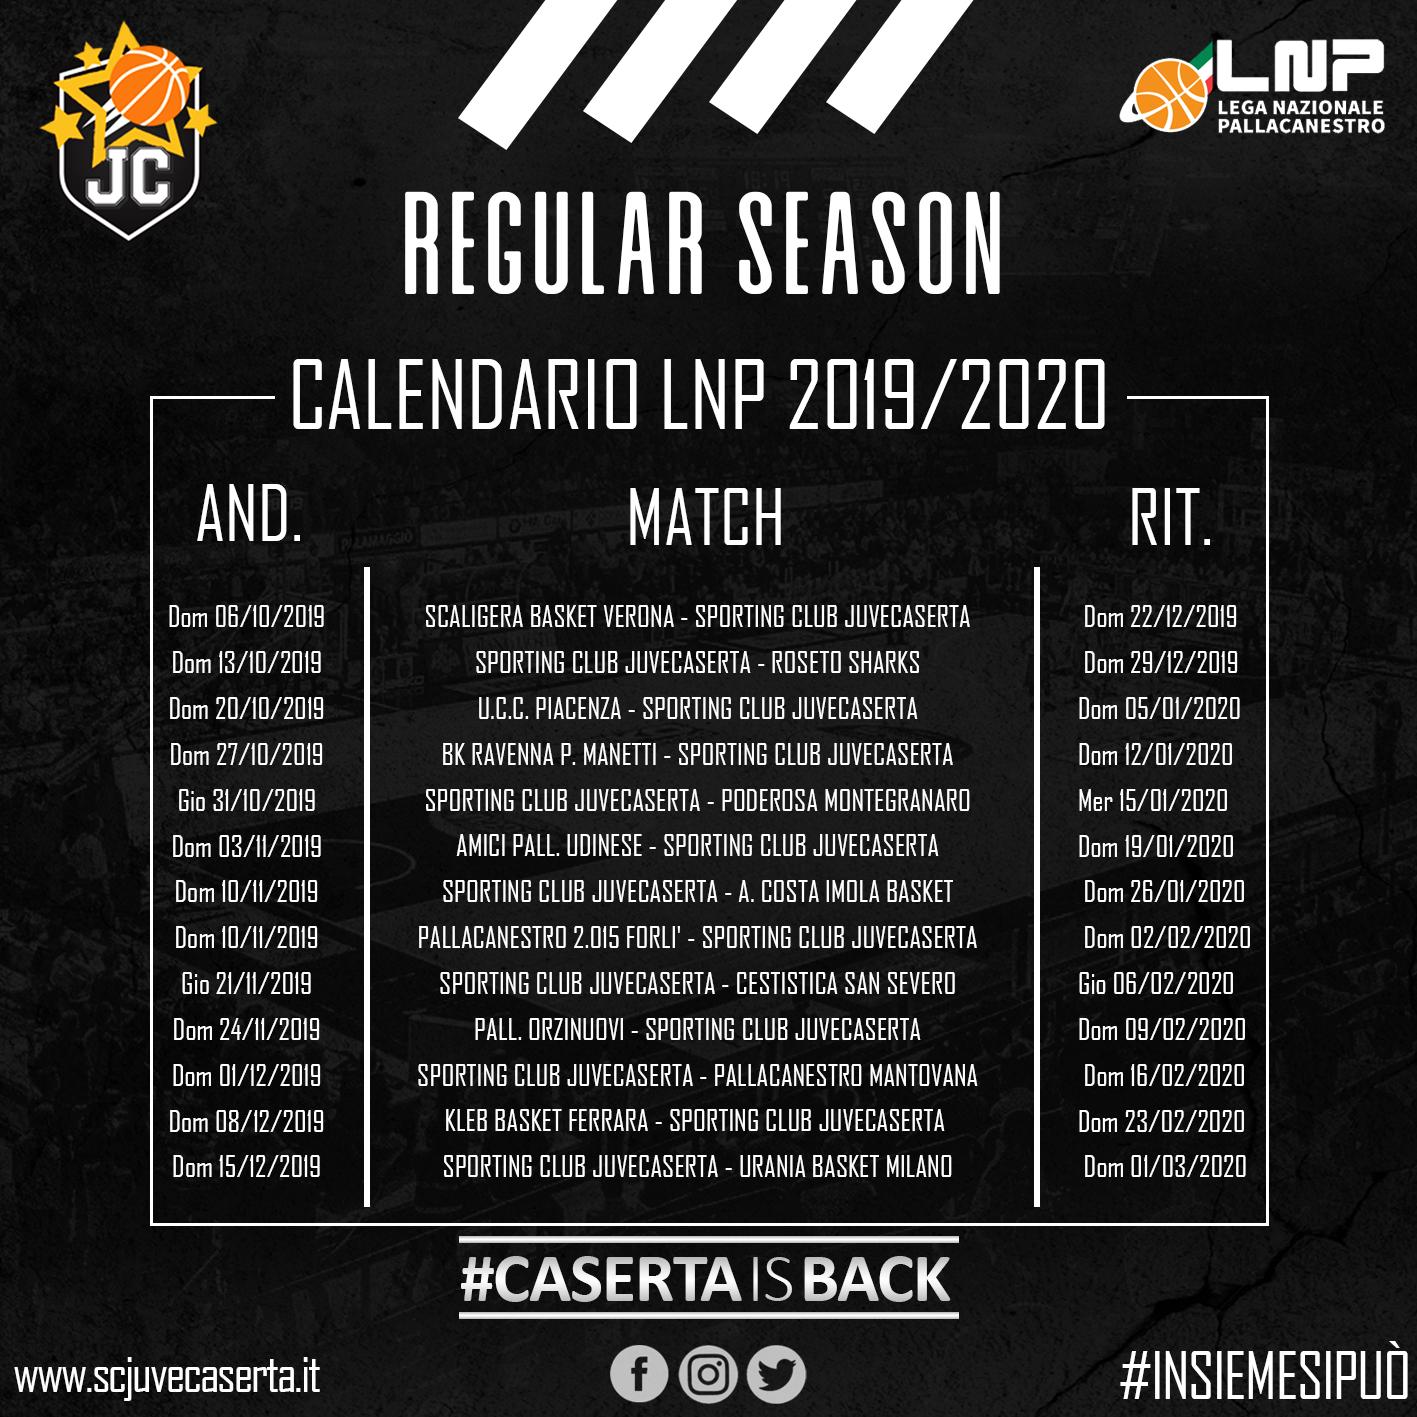 Serie A2 Basket Calendario.Basket Serie A2 Prima In Trasferta Per La Juve Caserta